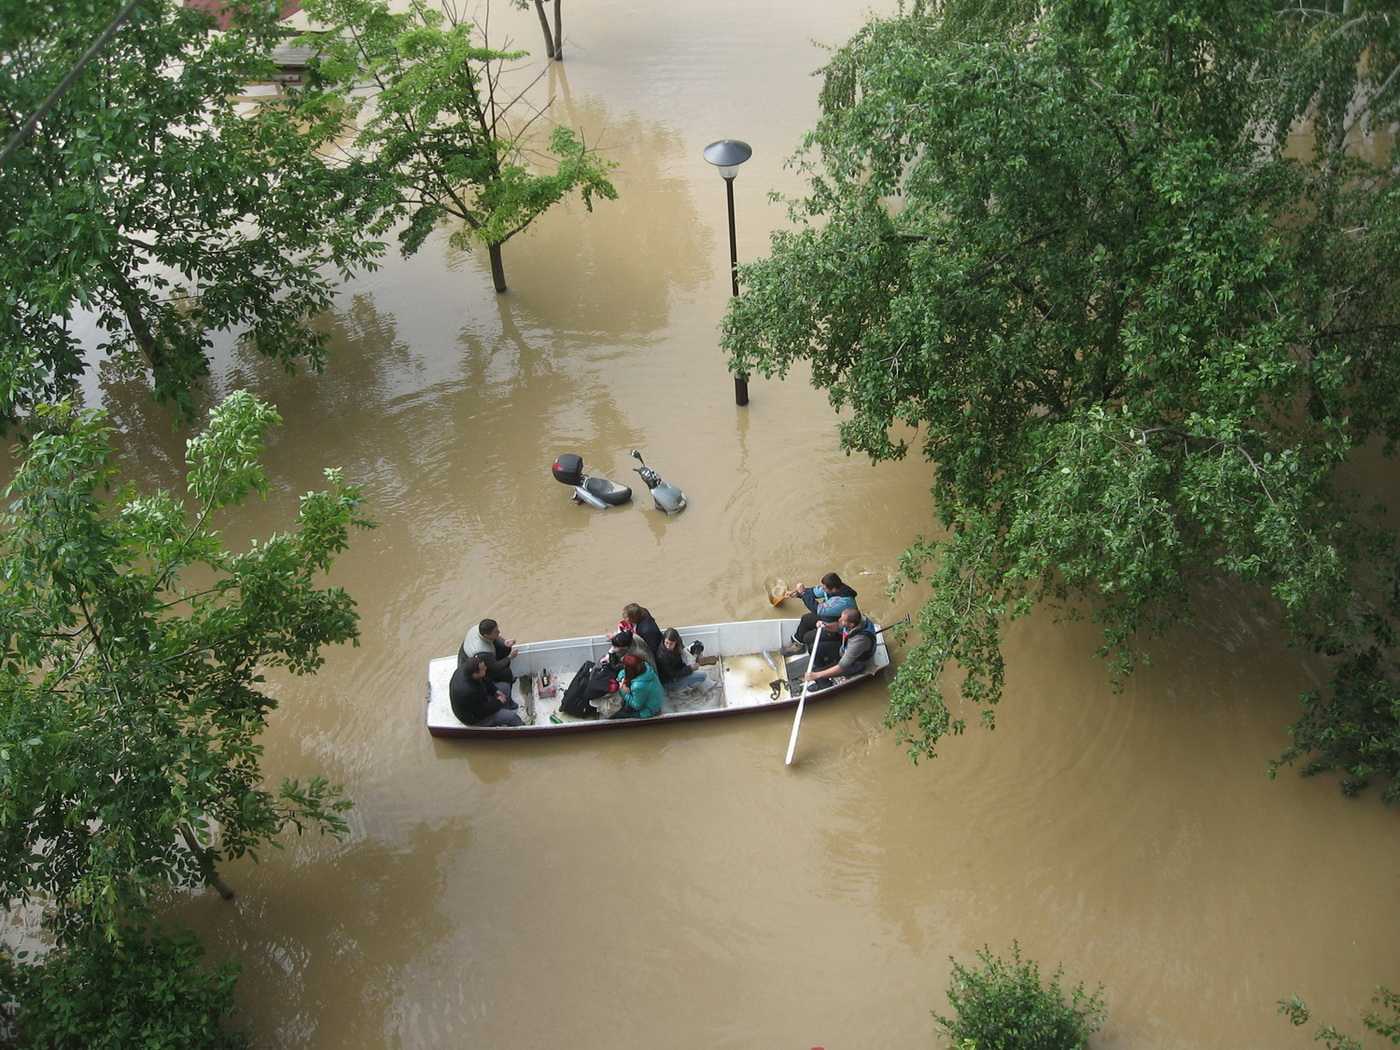 Spašavanje ljudi čamcima - Obrenovac